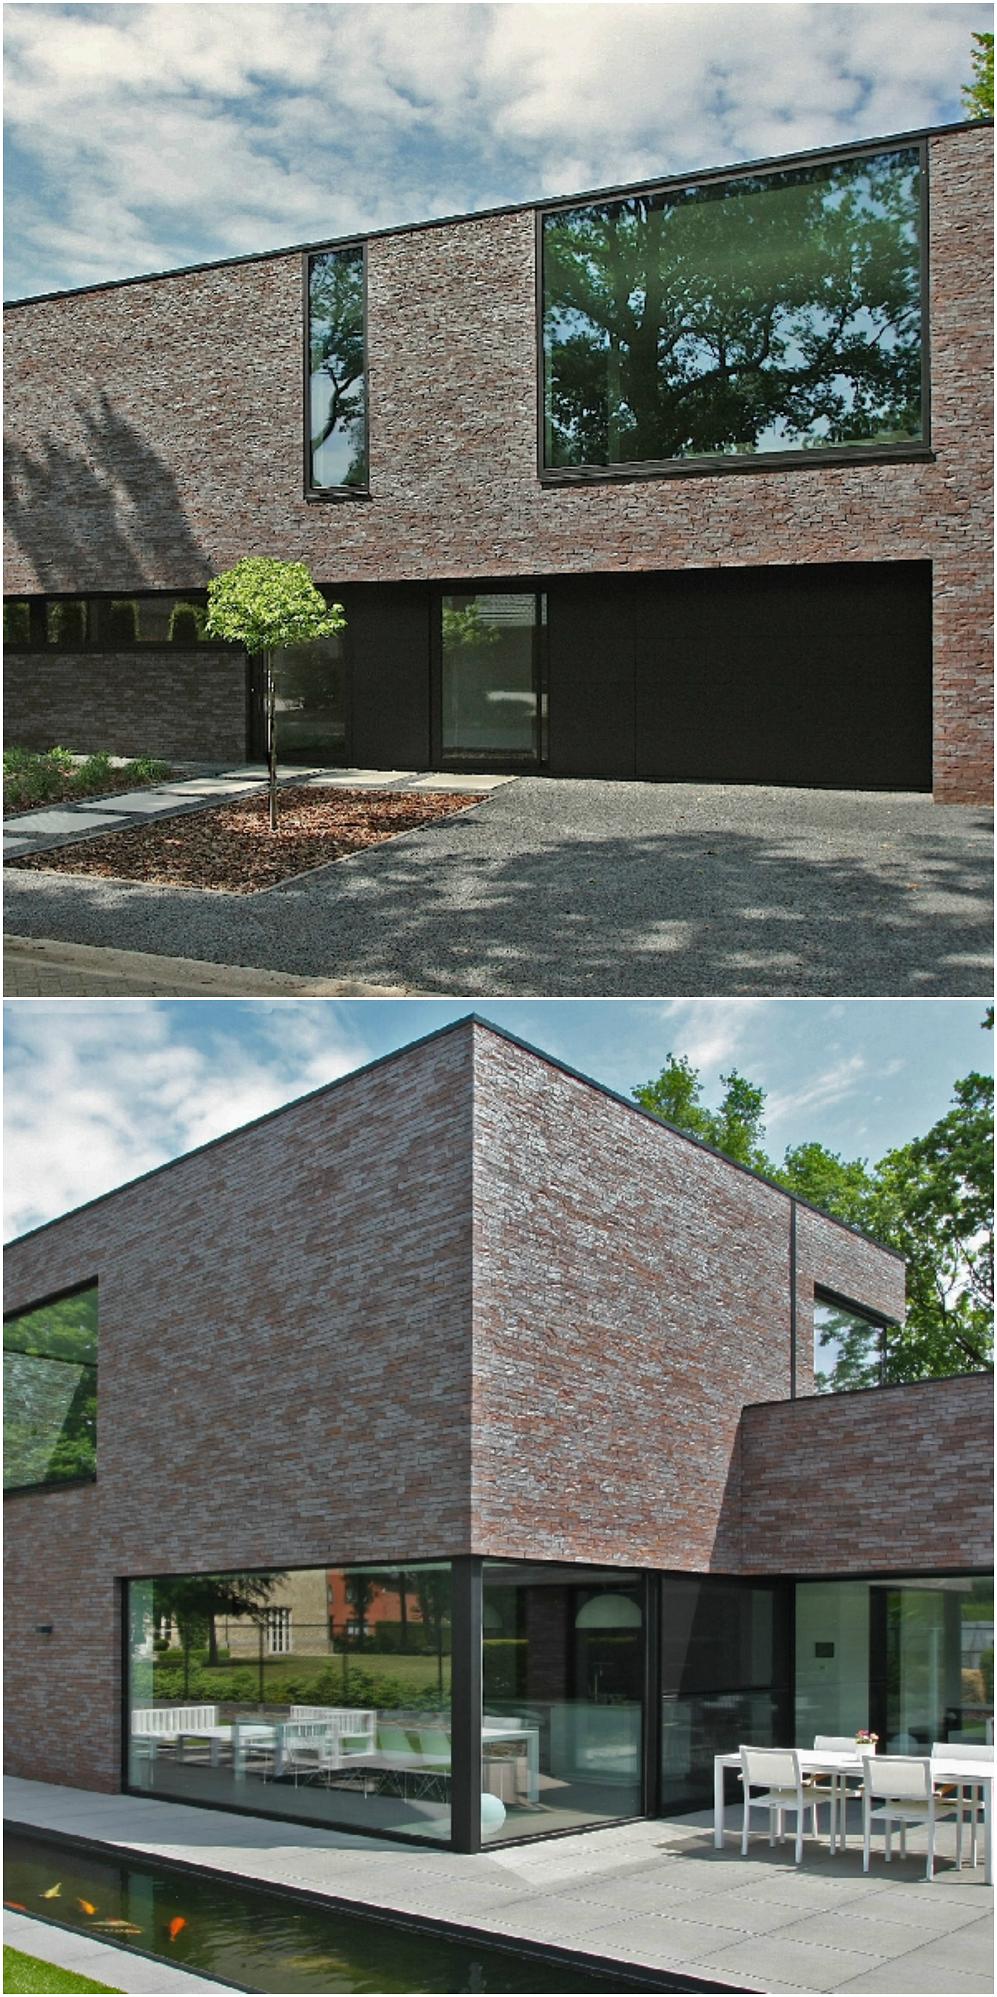 Twee generaties onder n energieneutraal dak architect for Hedendaagse architecten